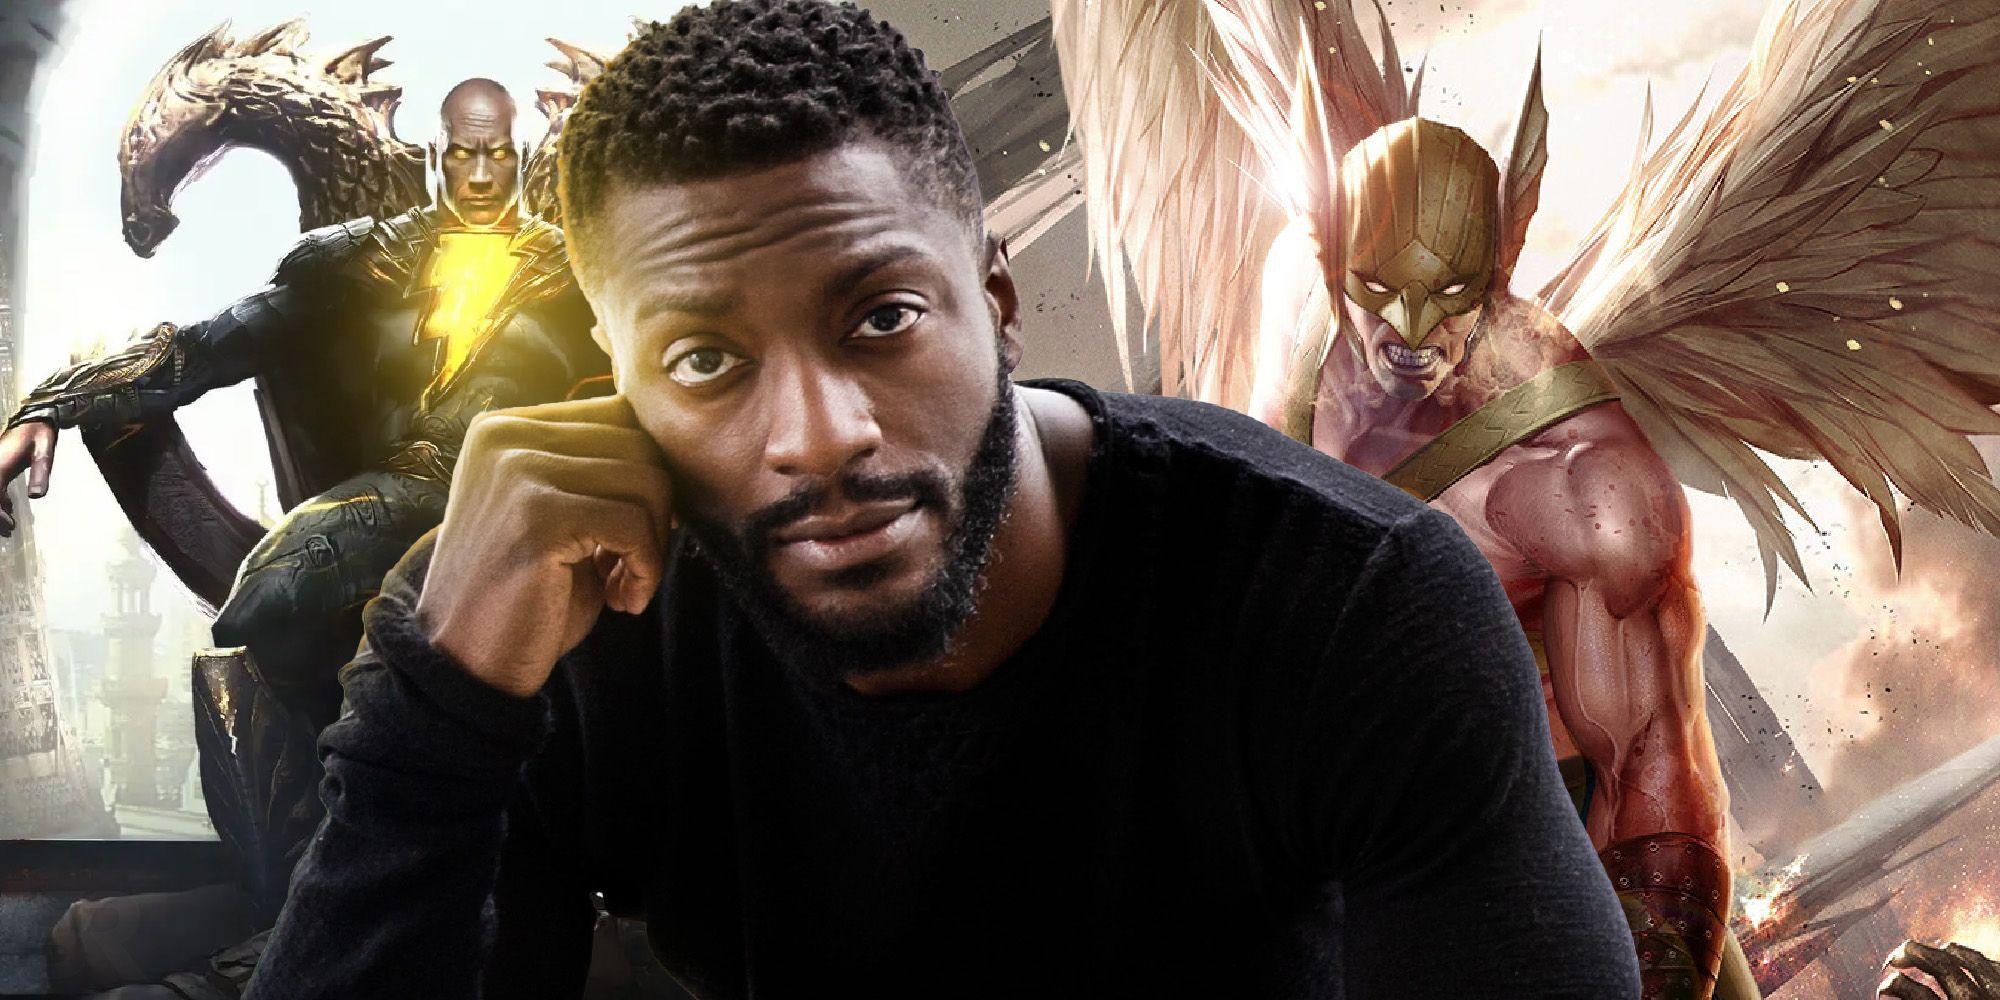 Black Adam: Aldis Hodge Inspired By Co-Star Dwayne Johnson's Career